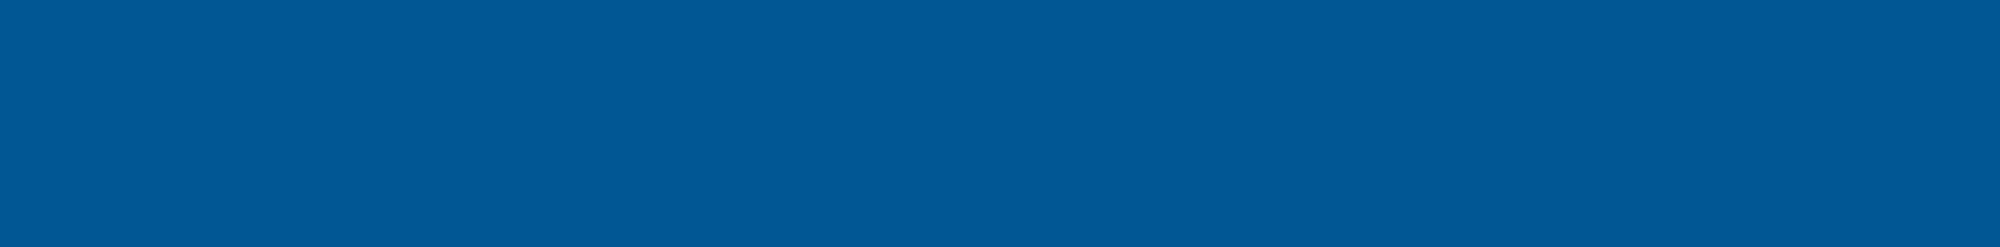 Ontec-logo